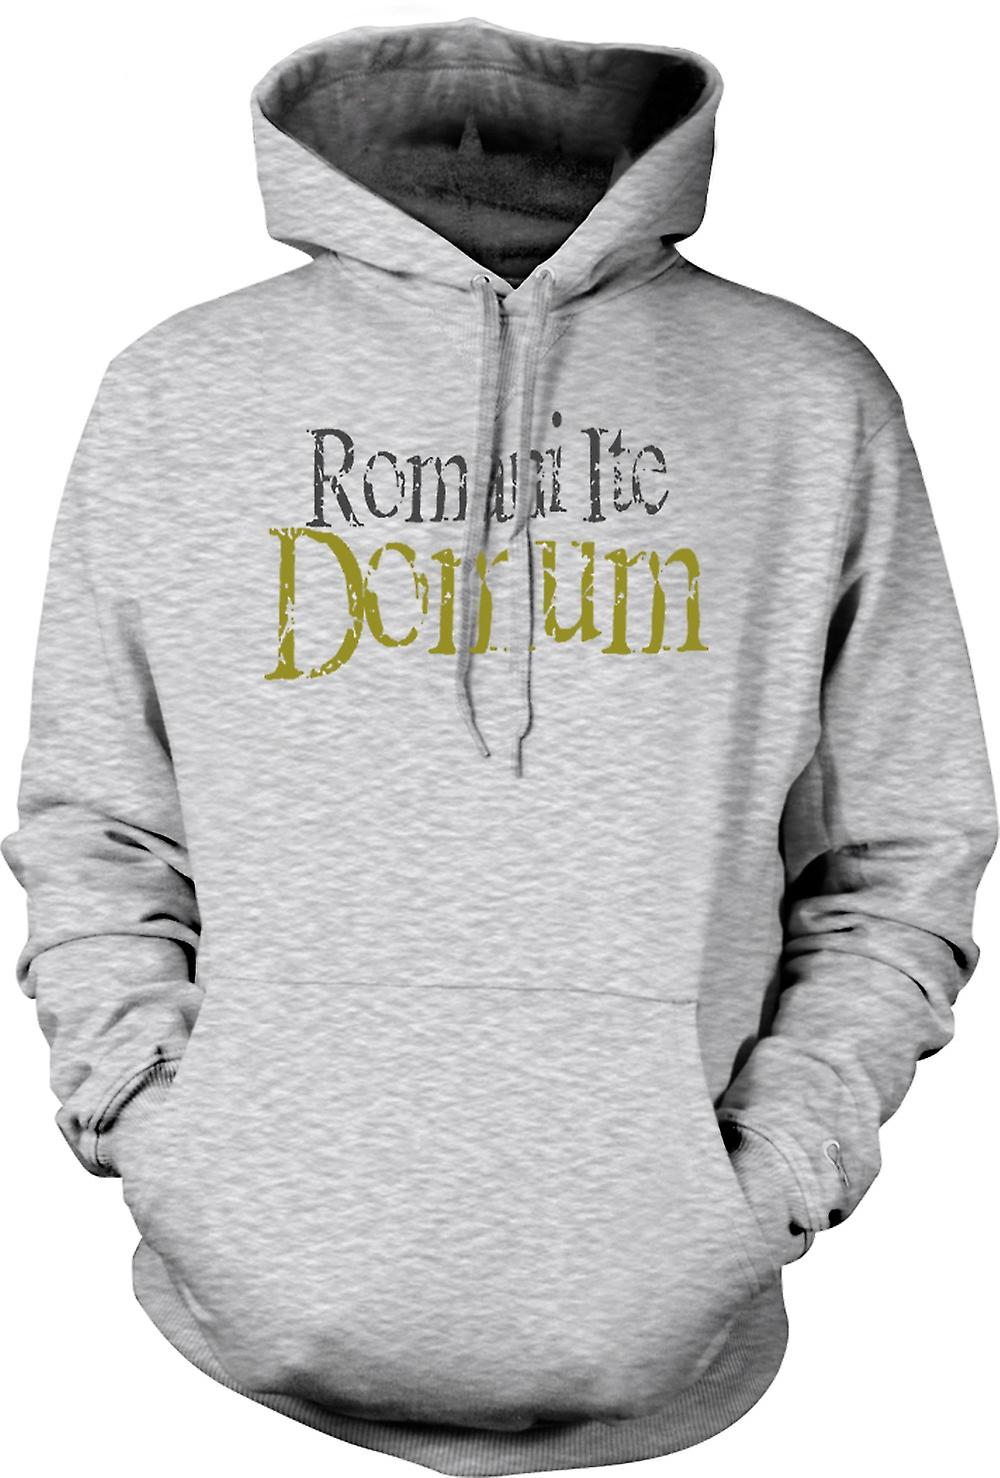 Mens-Hoodie - Romani Ite Domum - lustig